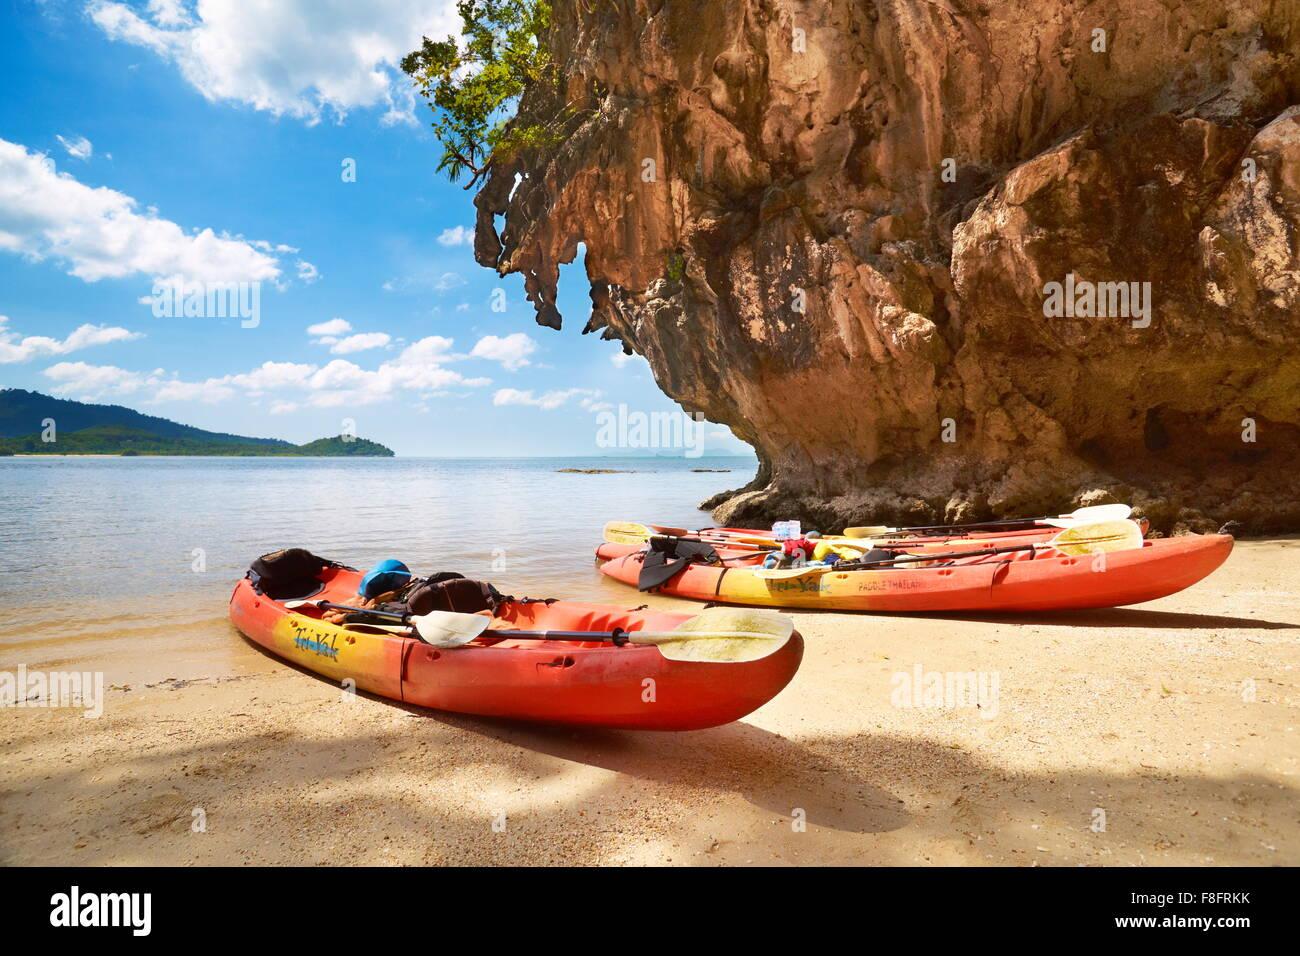 Tailandia - La Bahía Phang Nga, paisaje, viaje en canoa Imagen De Stock